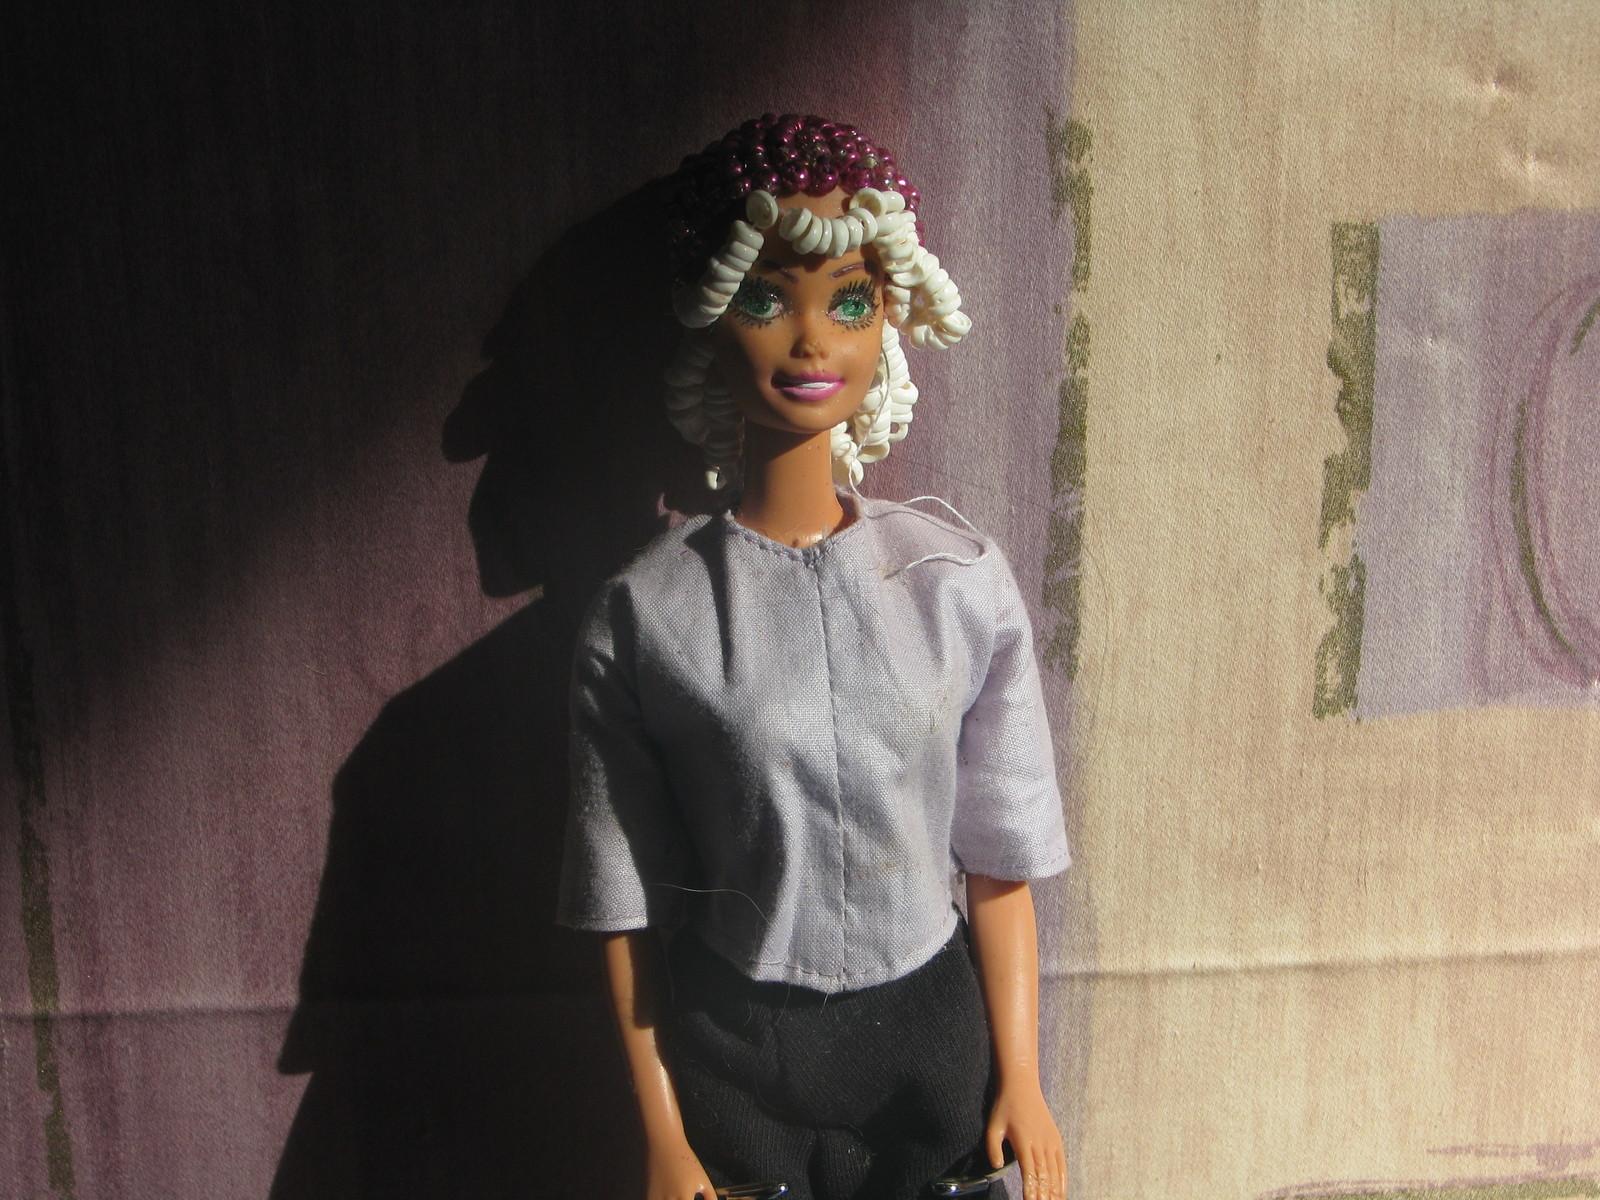 Beaded Hair Fashion Doll Haleeah OOAK Refashioned Barbie